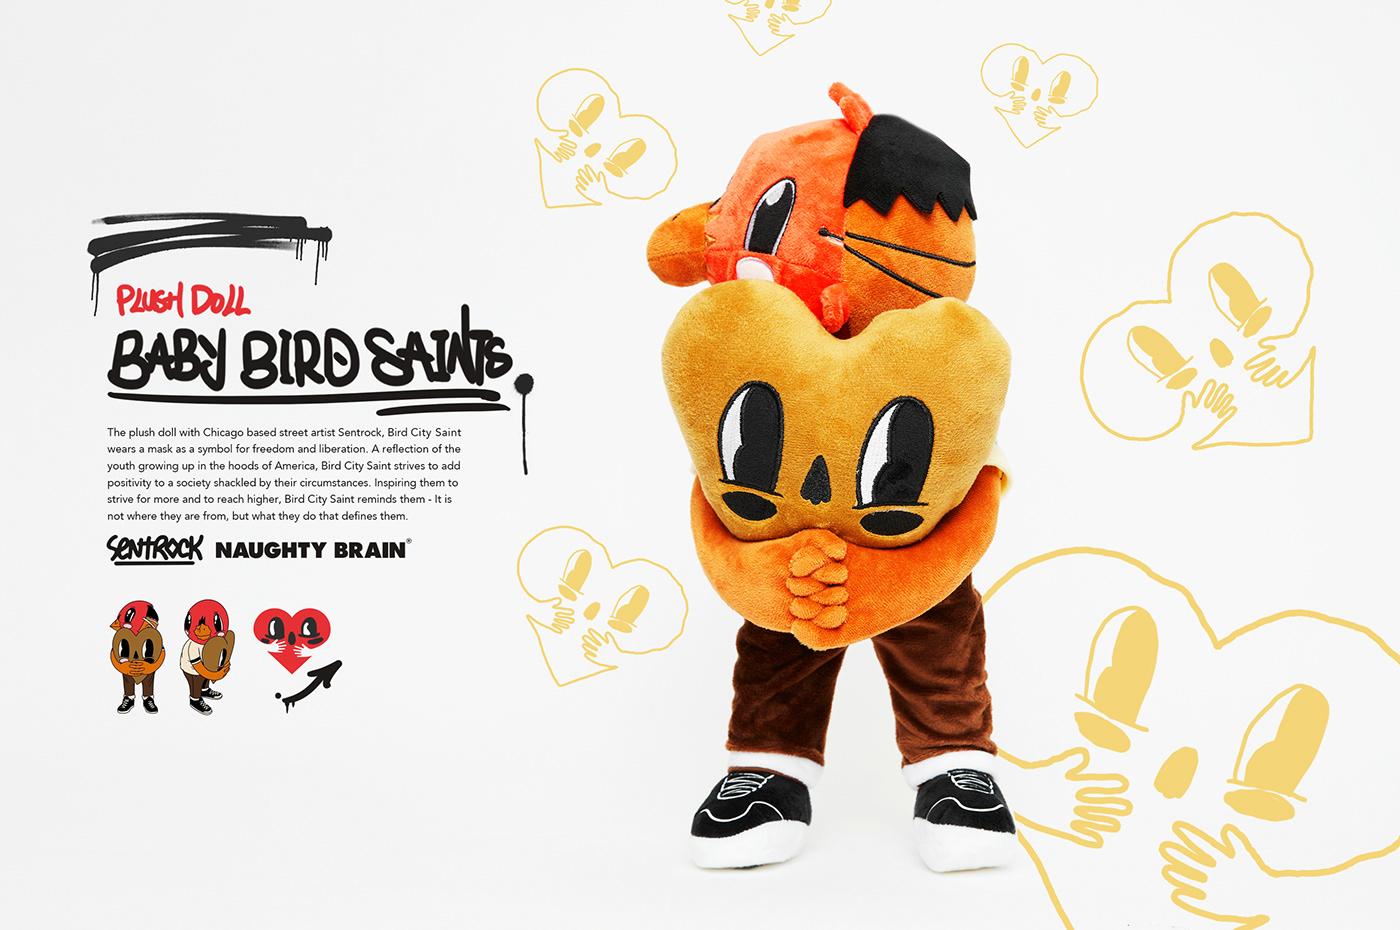 artfigure arttoy babybird birdman CURIOUSBOY designertoy naughtybrain plushdoll toydesign toymaker